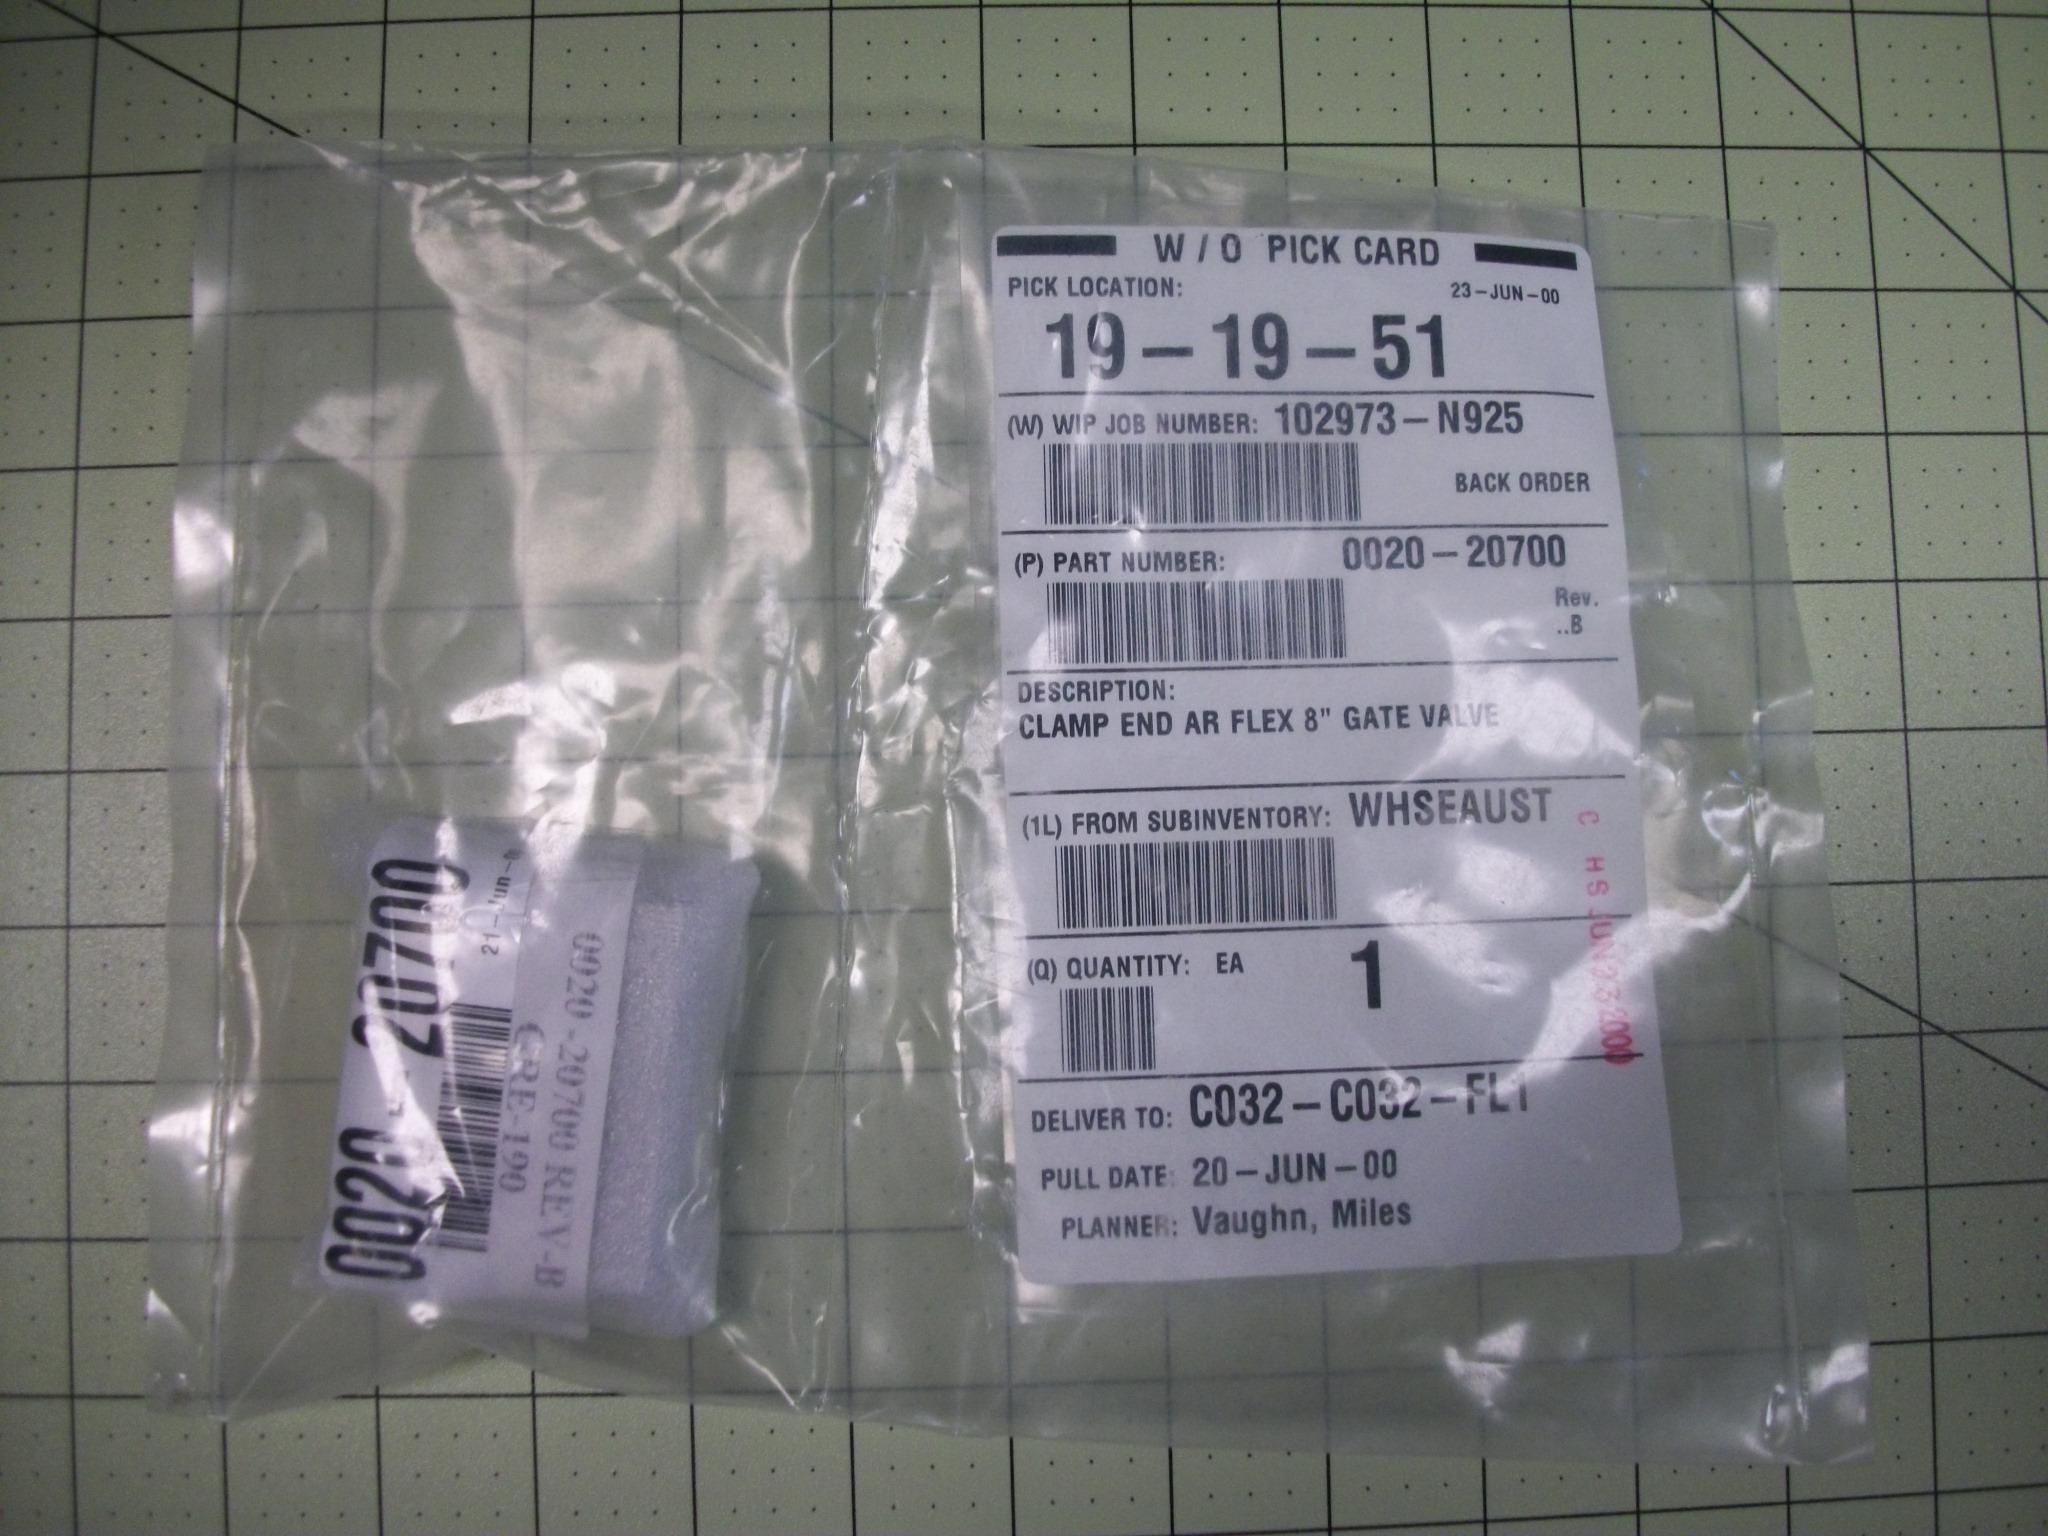 "Clamp end AR flex 8"" gate valve"